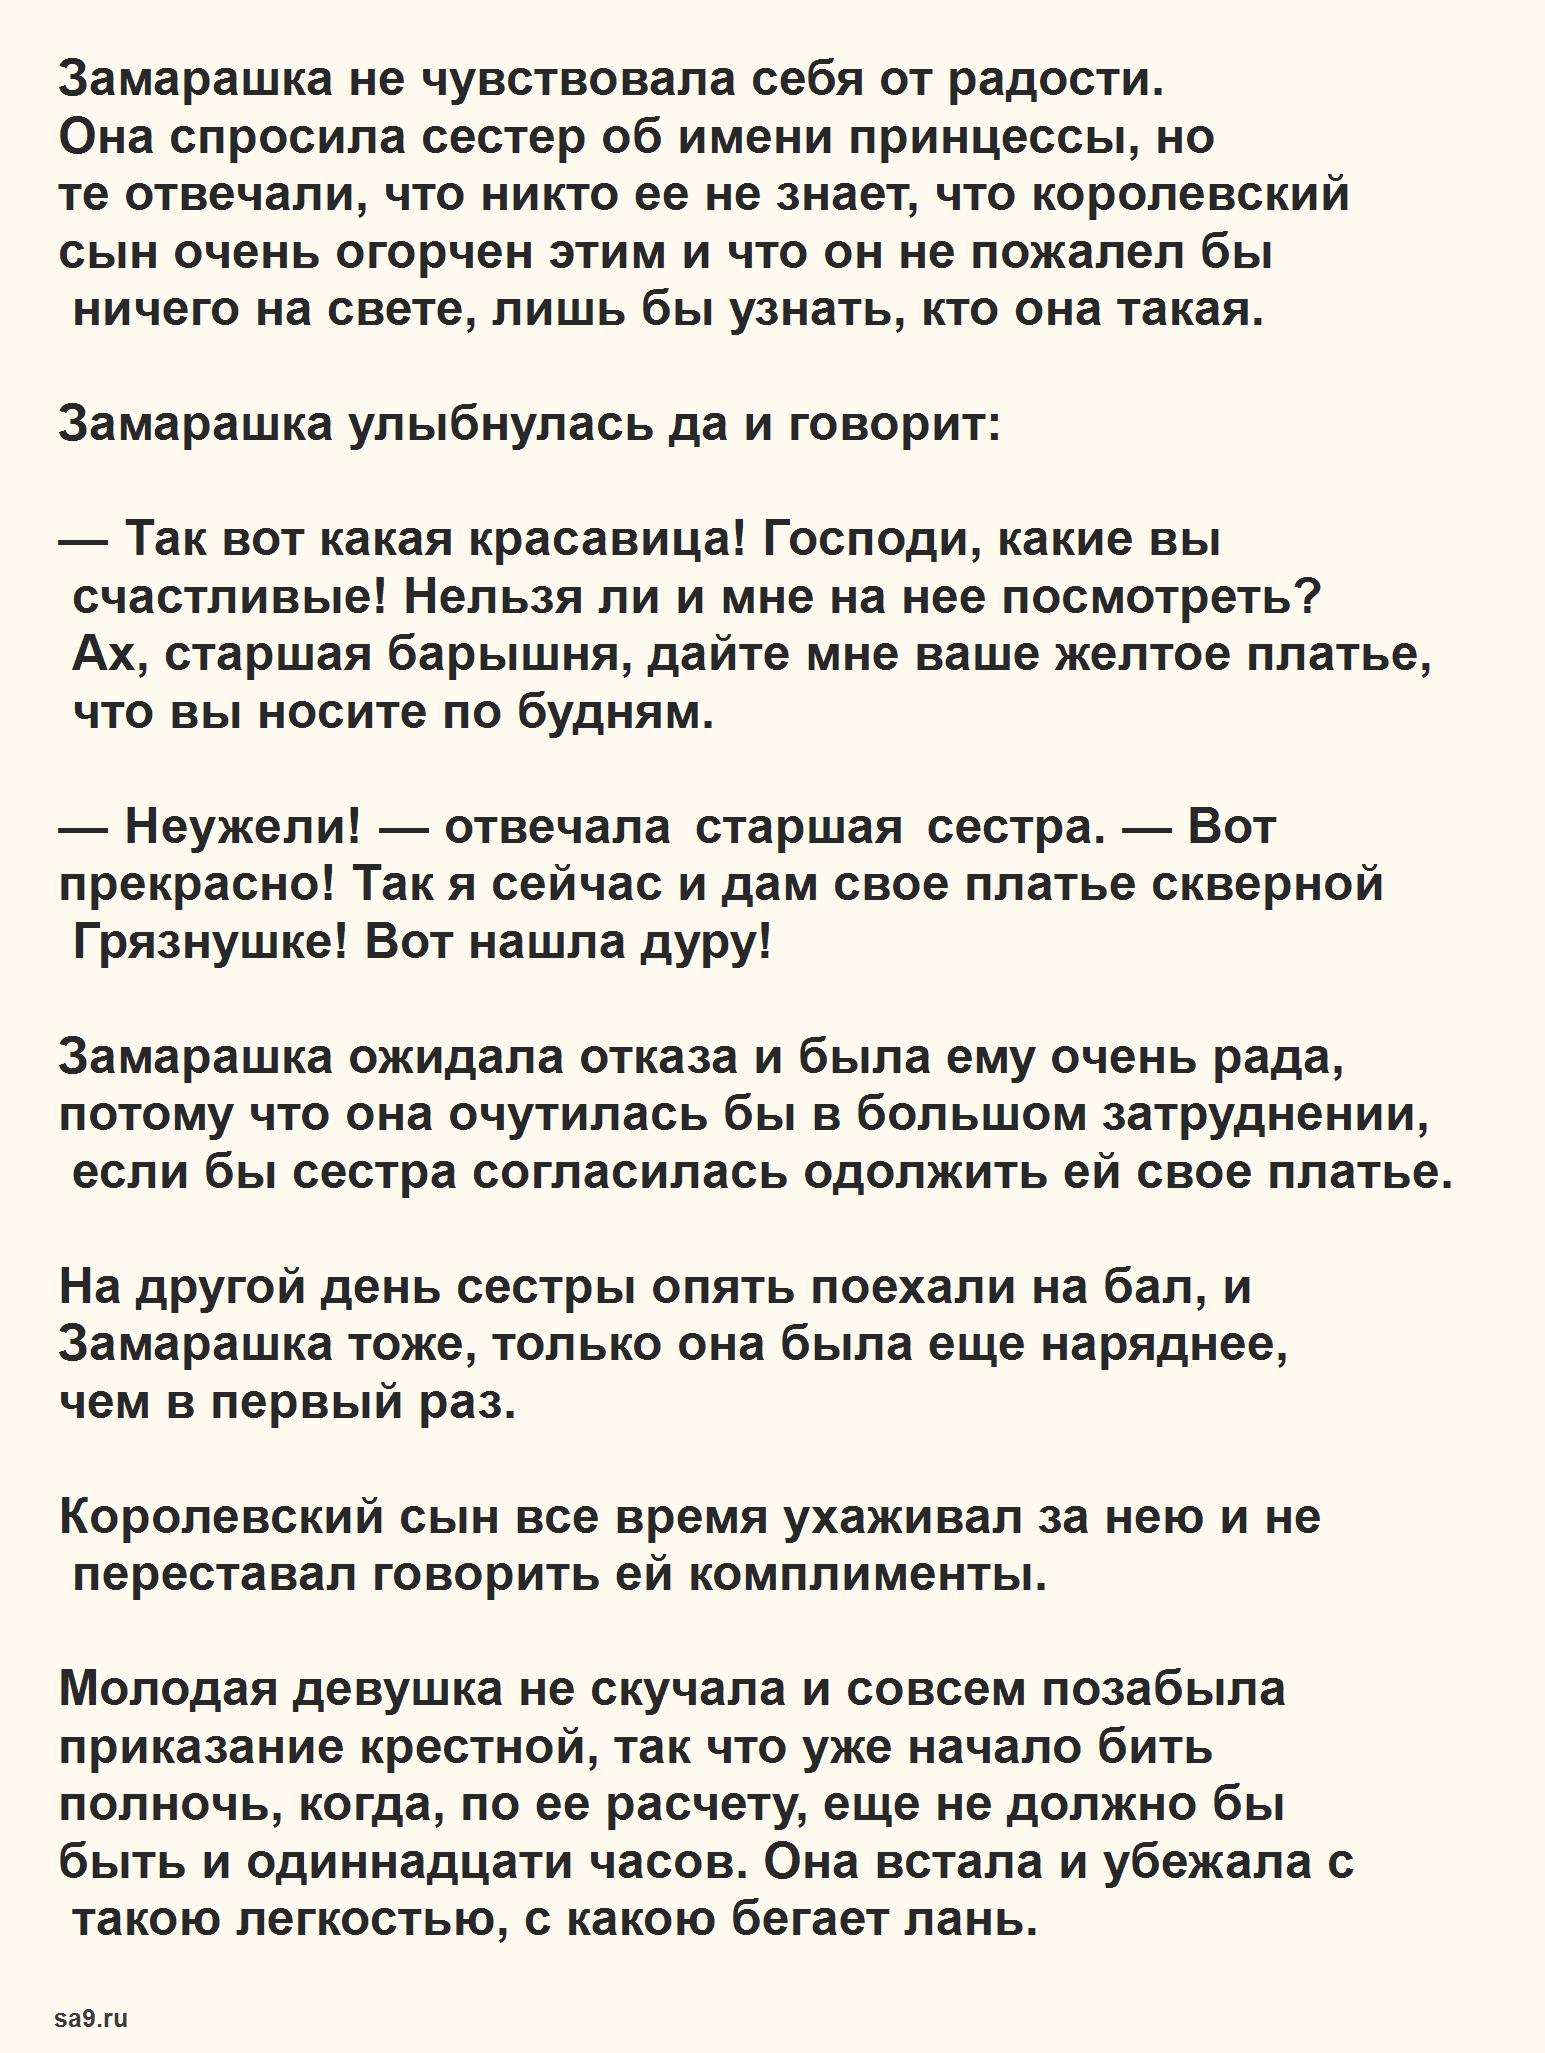 Читать сказку - Замарашка, Шарля Перро